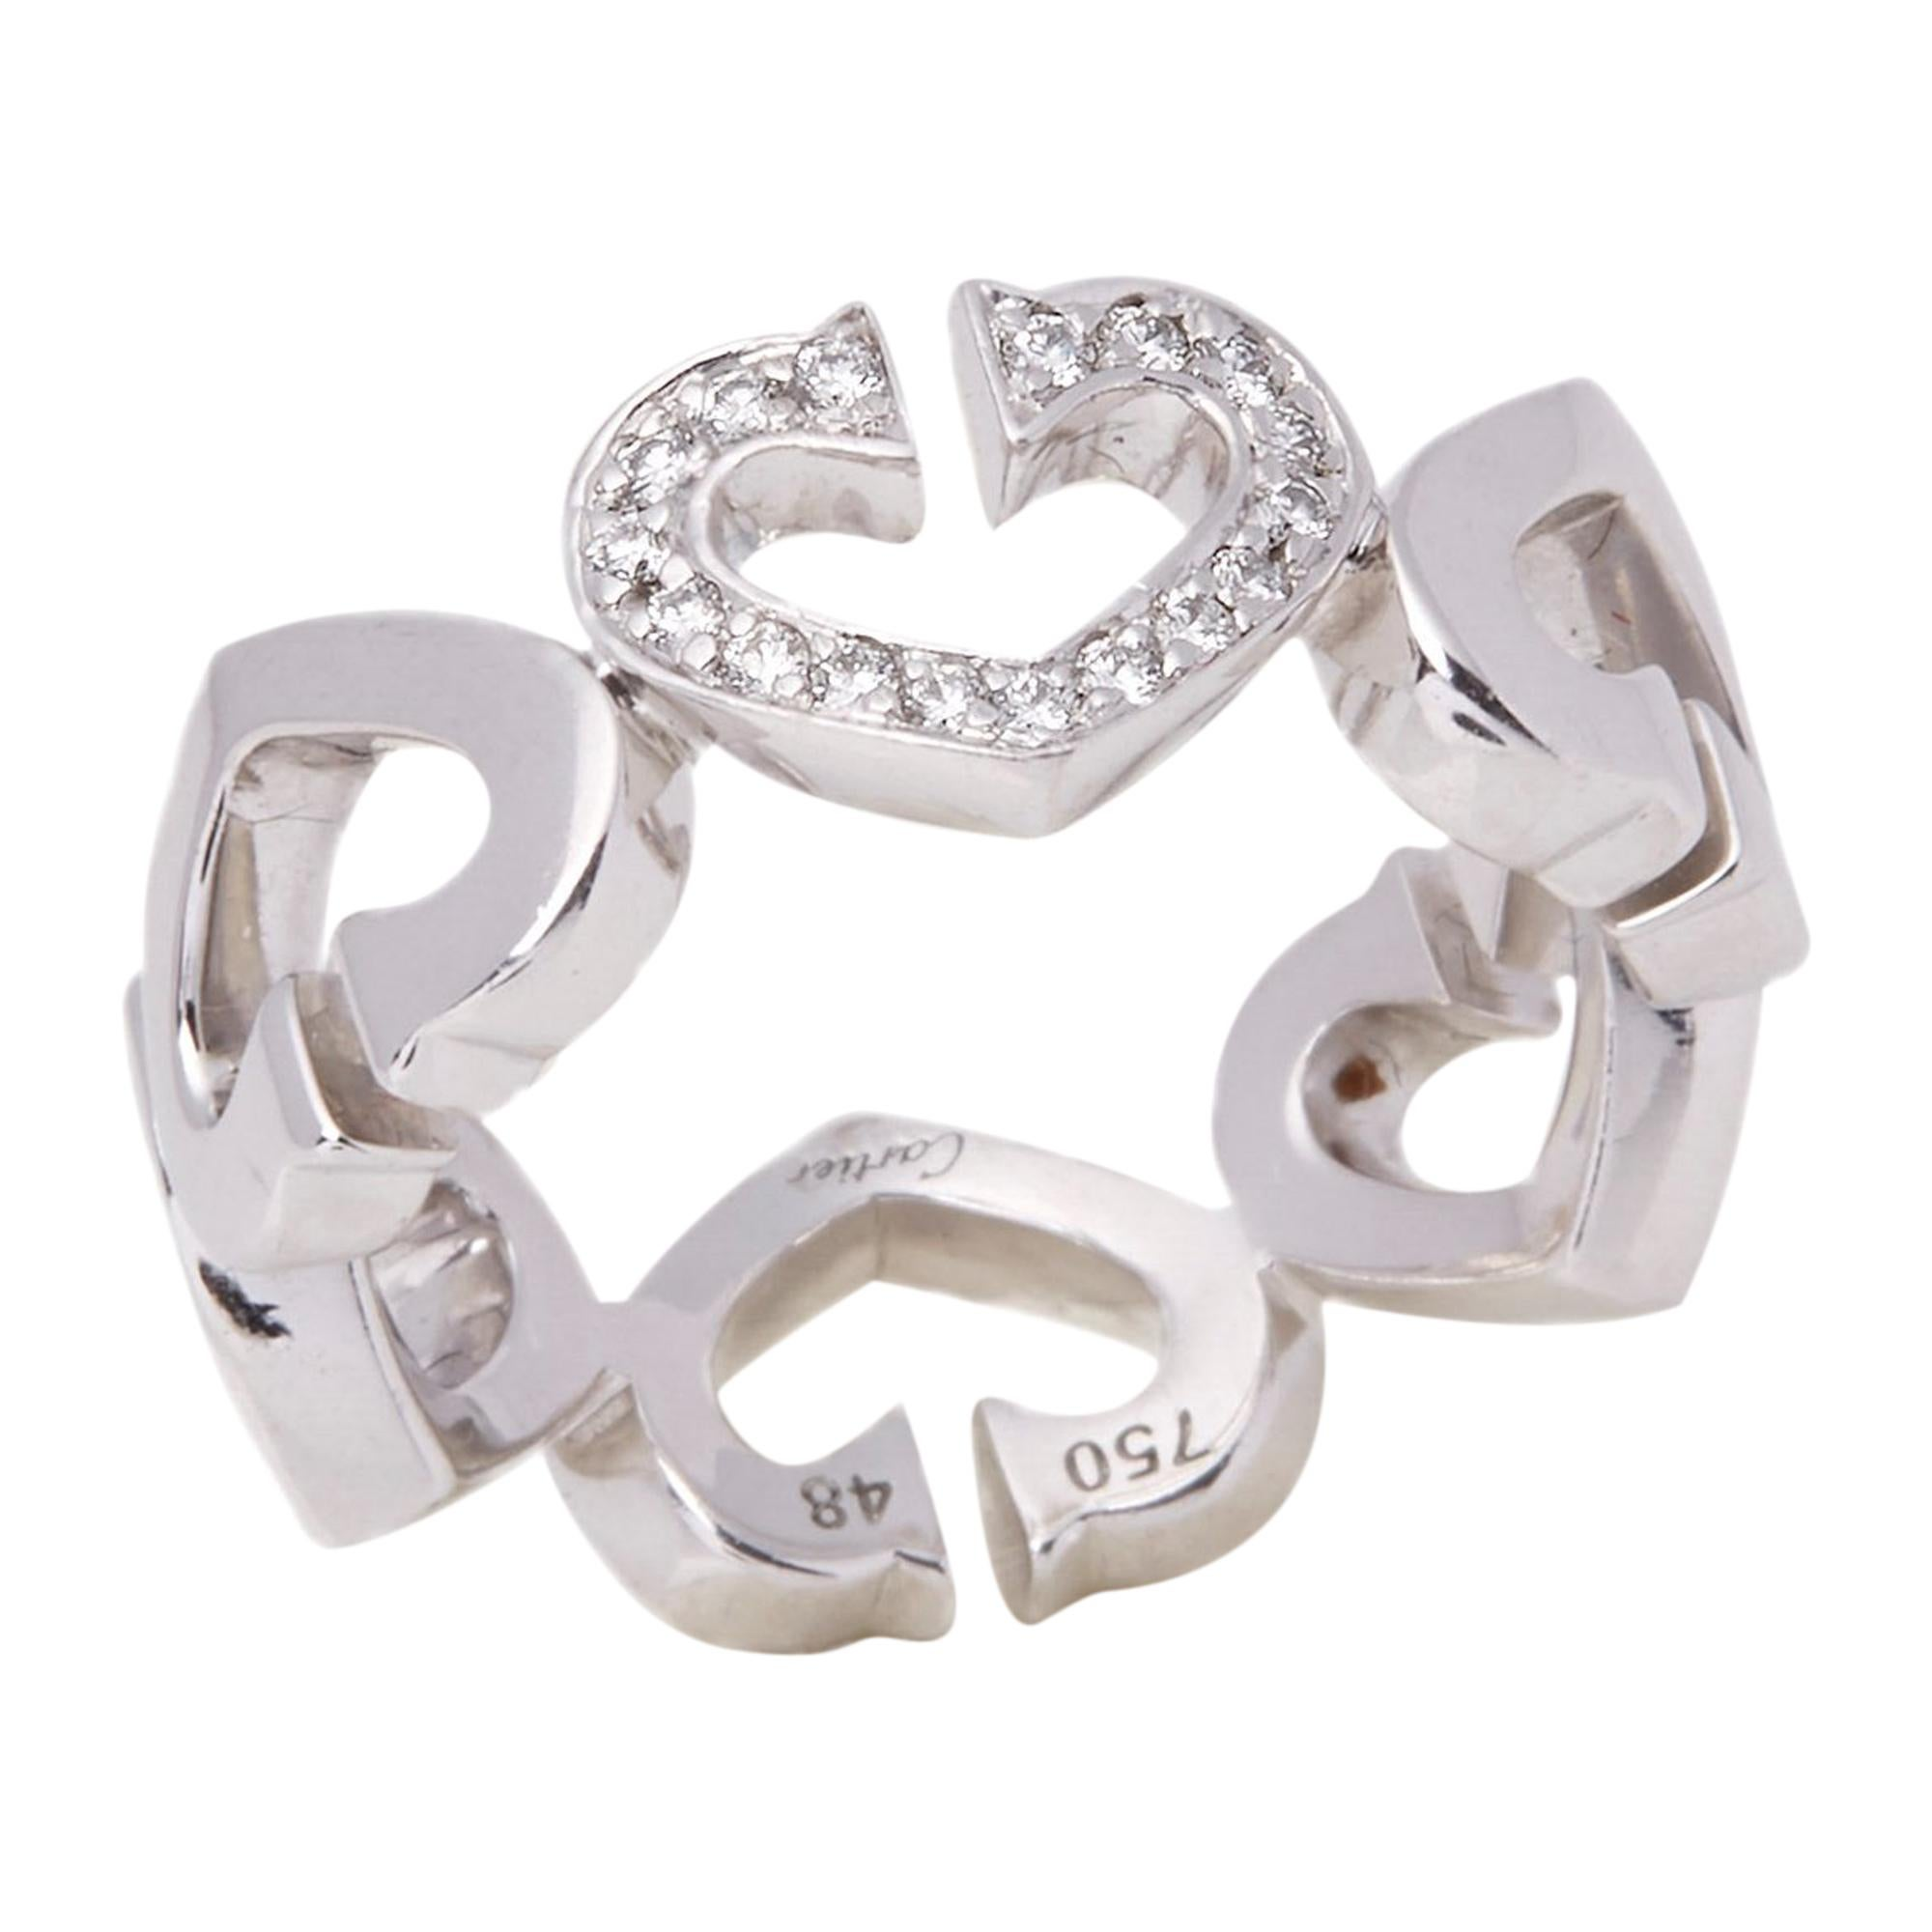 Cartier 18 Karat White Gold Hearts and Symbols Ring